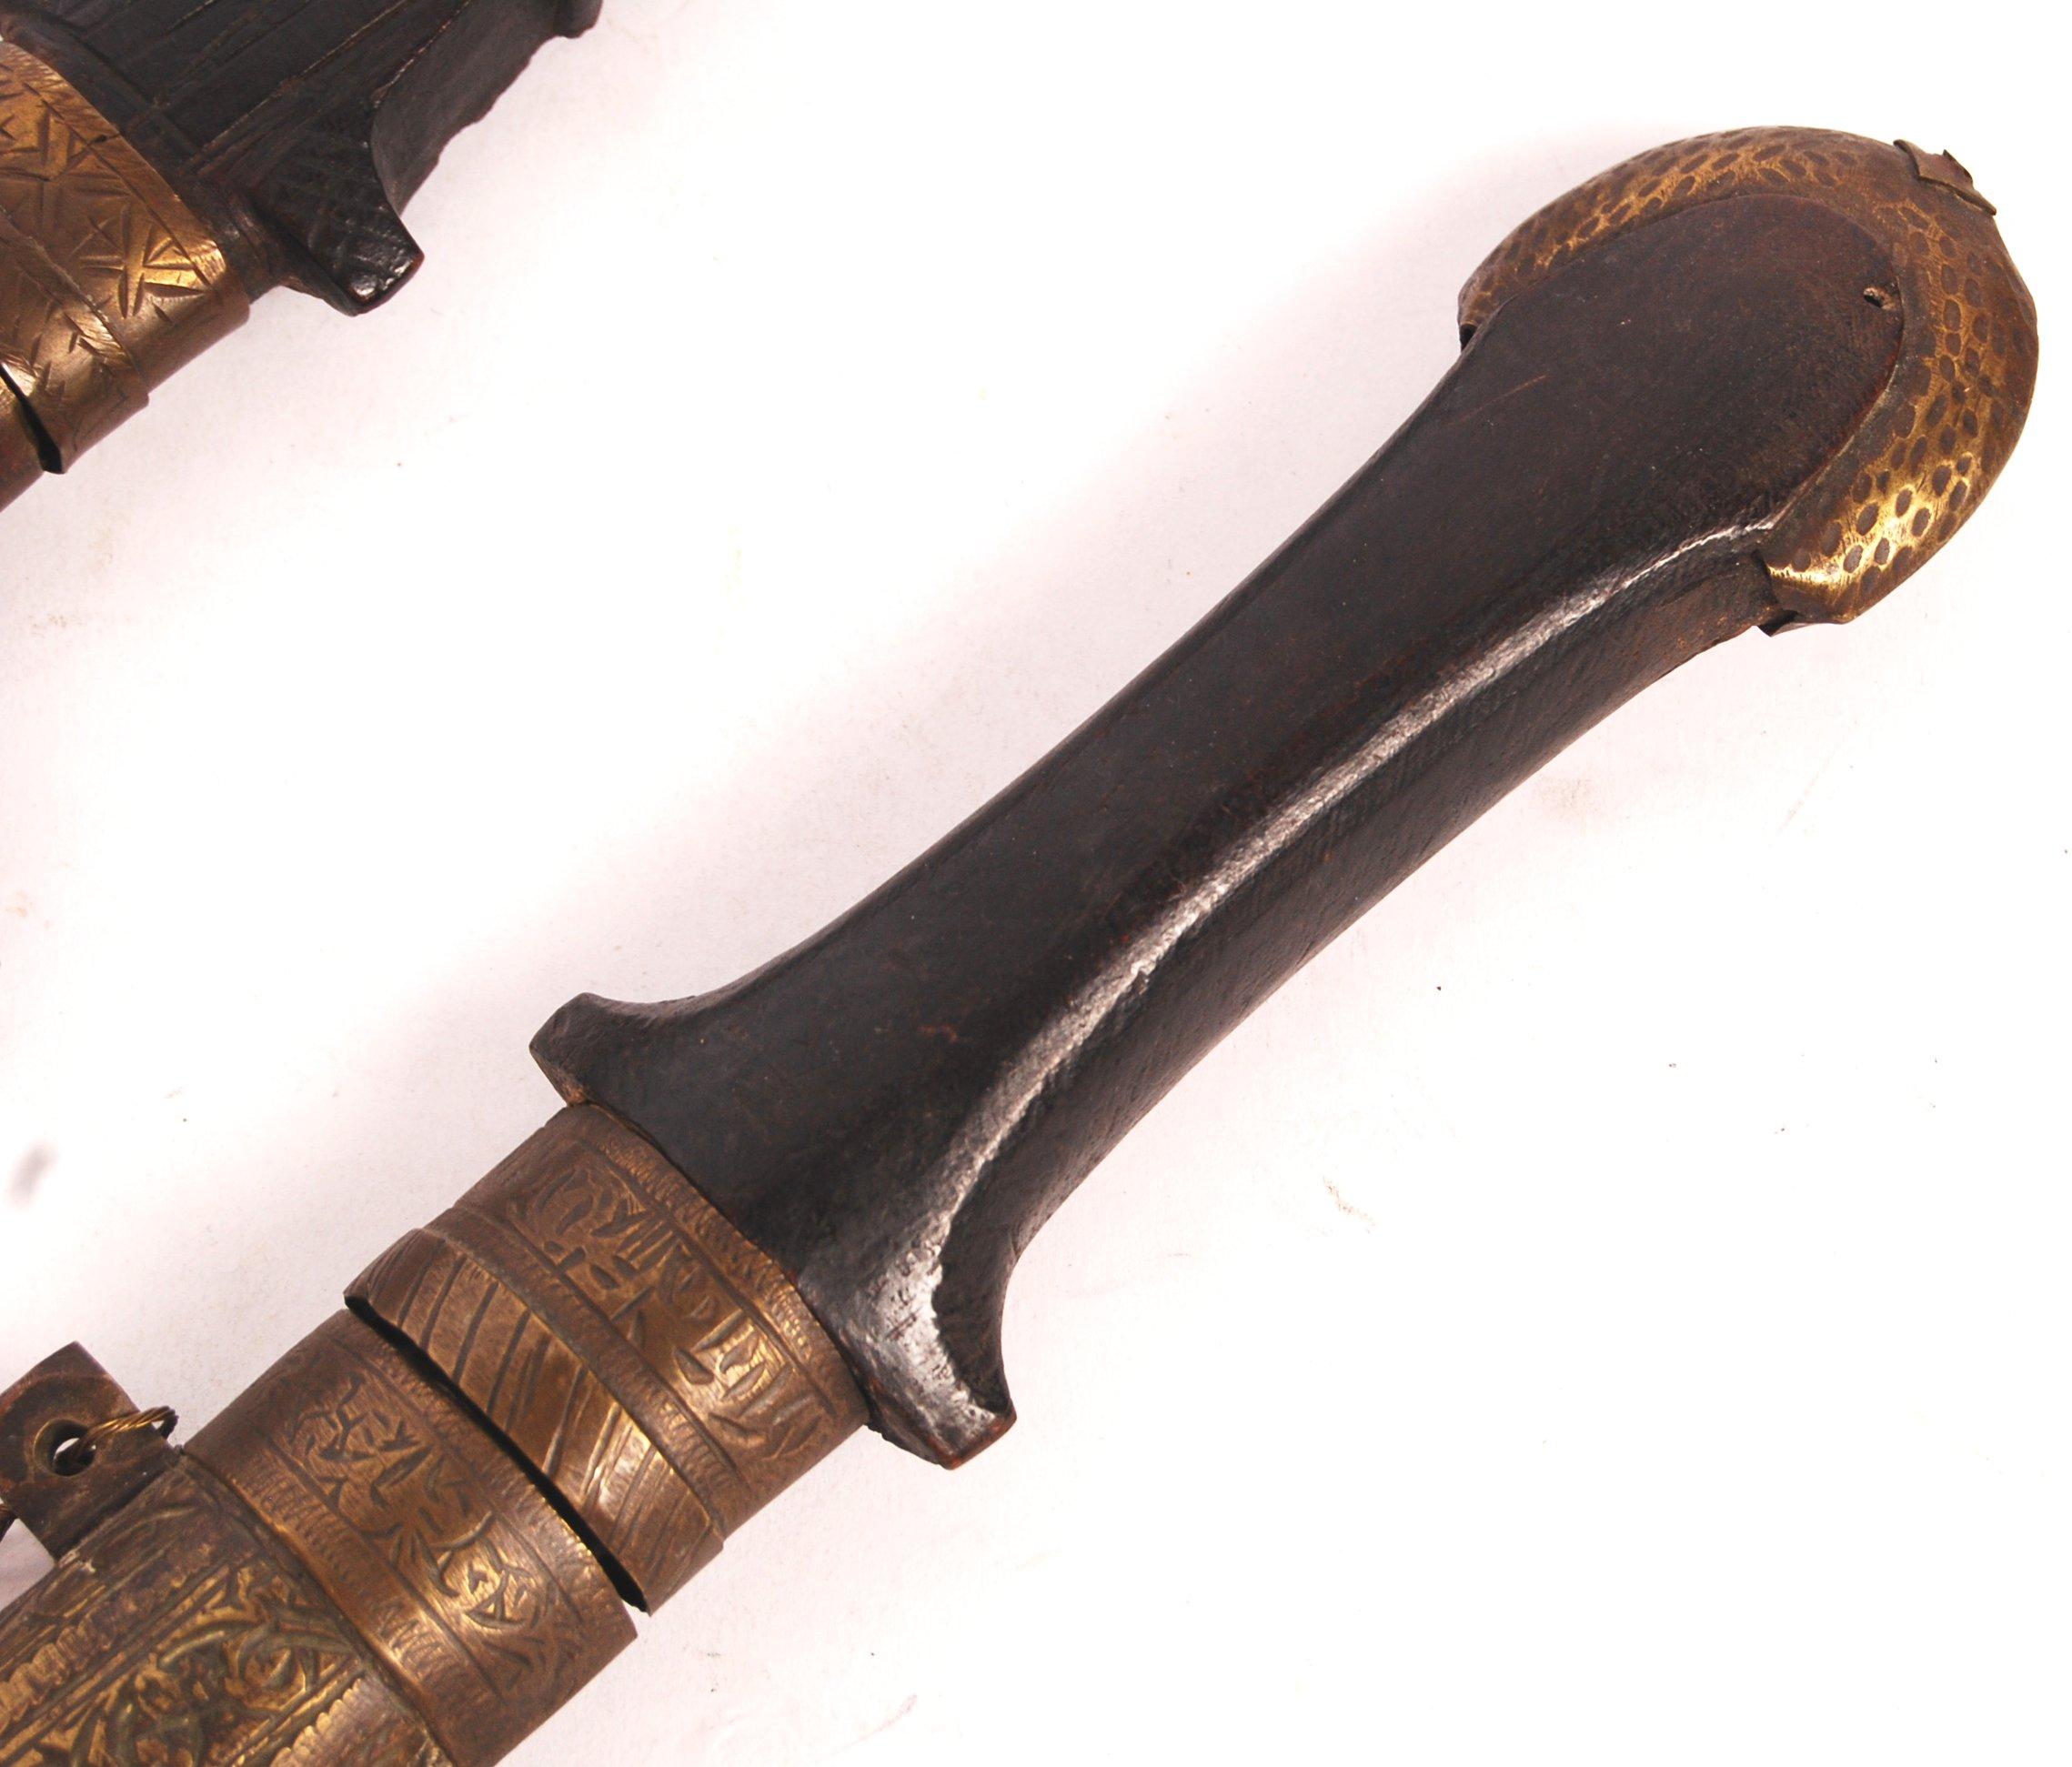 TWO 19TH CENTURY BEREBER / MOROCCAN KOUMMYA / JAMBIYA (DAGGERS) - Image 3 of 6